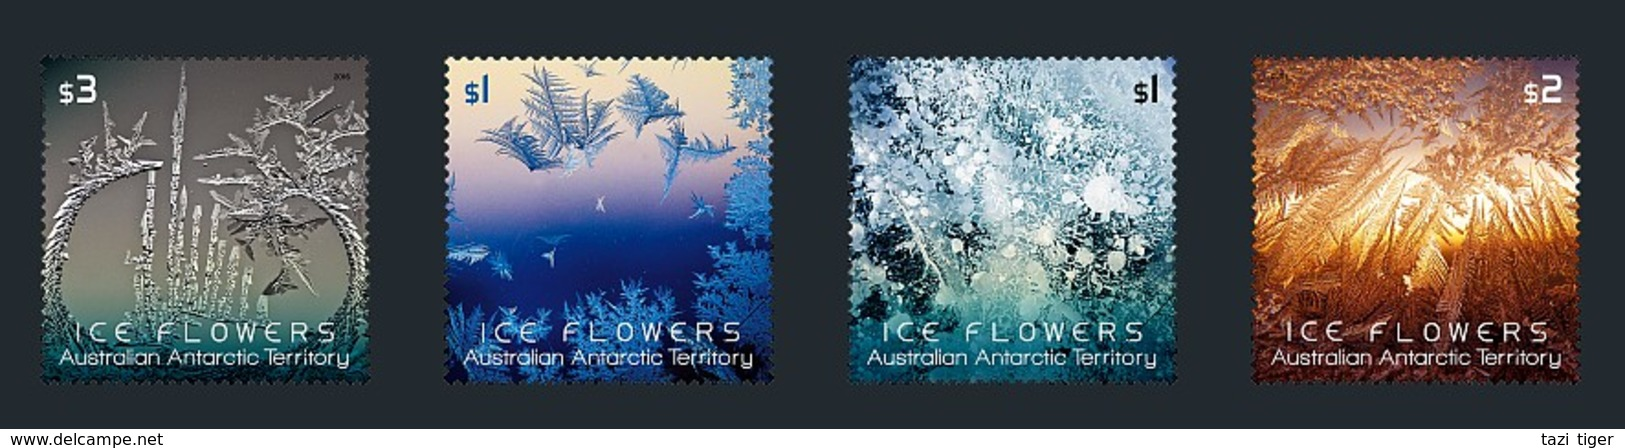 AUSTRALIAN ANTARCTIC TERRITORY (AAT) • 2016 • Ice Flowers - MNH (4) - Unused Stamps